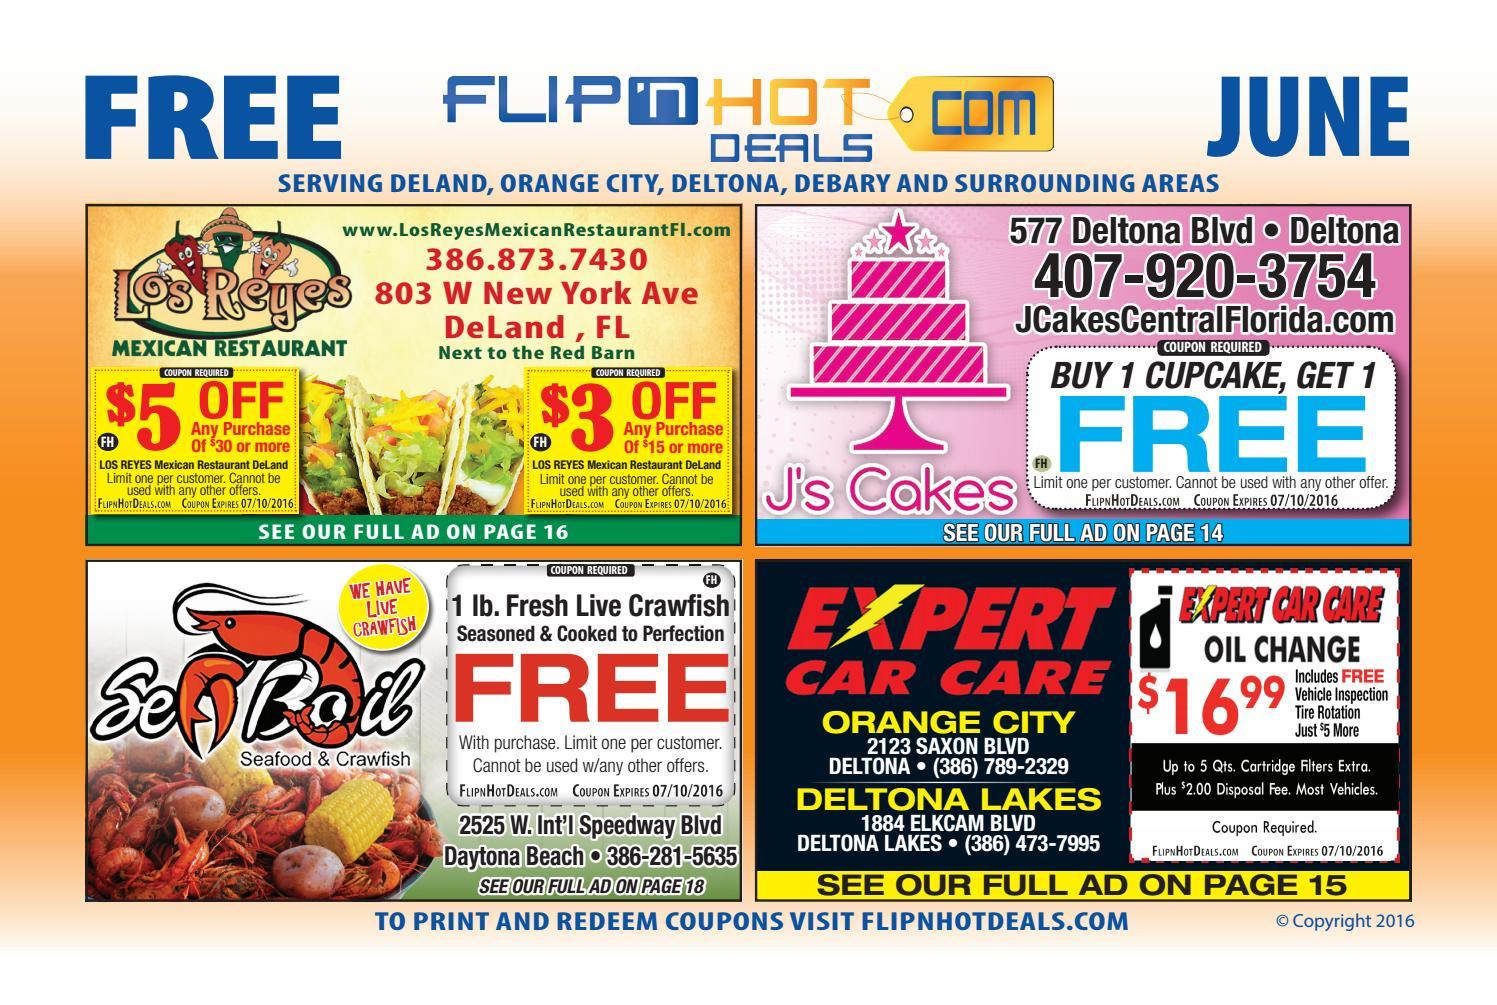 flip'nhot deals coupon book june 2016 - deland area by flip